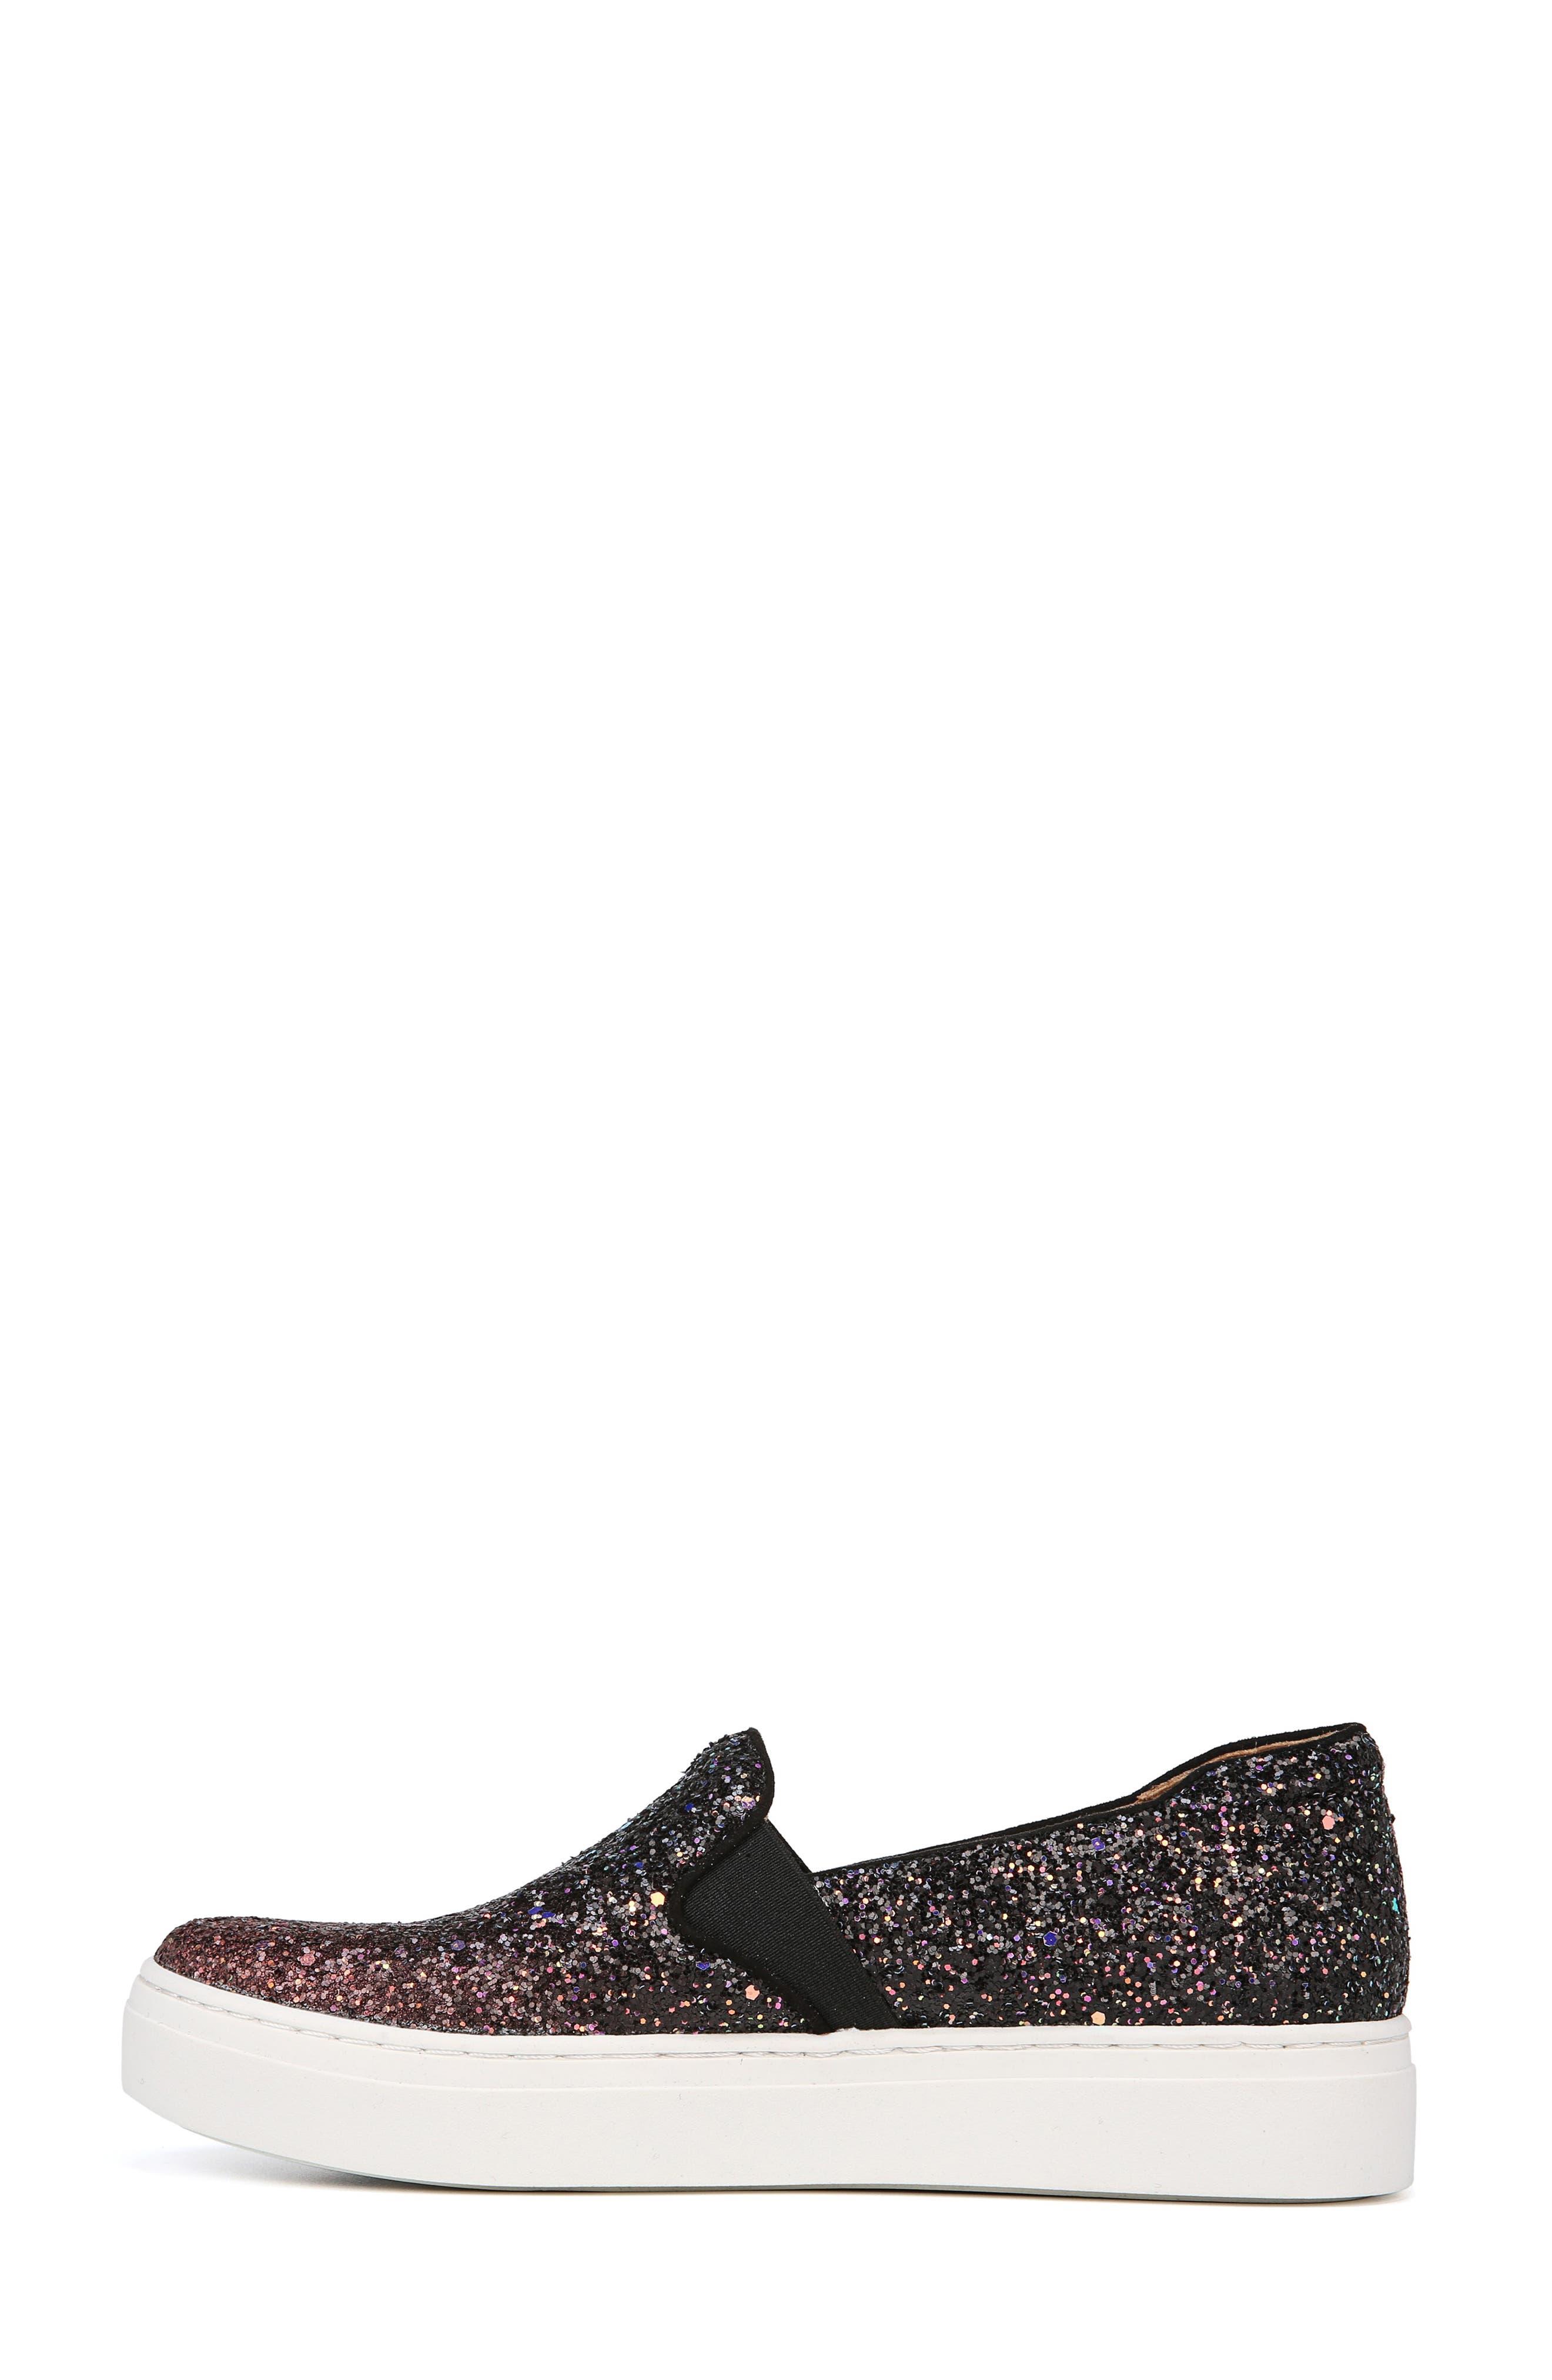 NATURALIZER, Carly Slip-On Sneaker, Alternate thumbnail 7, color, MULTI GLITTER FABRIC